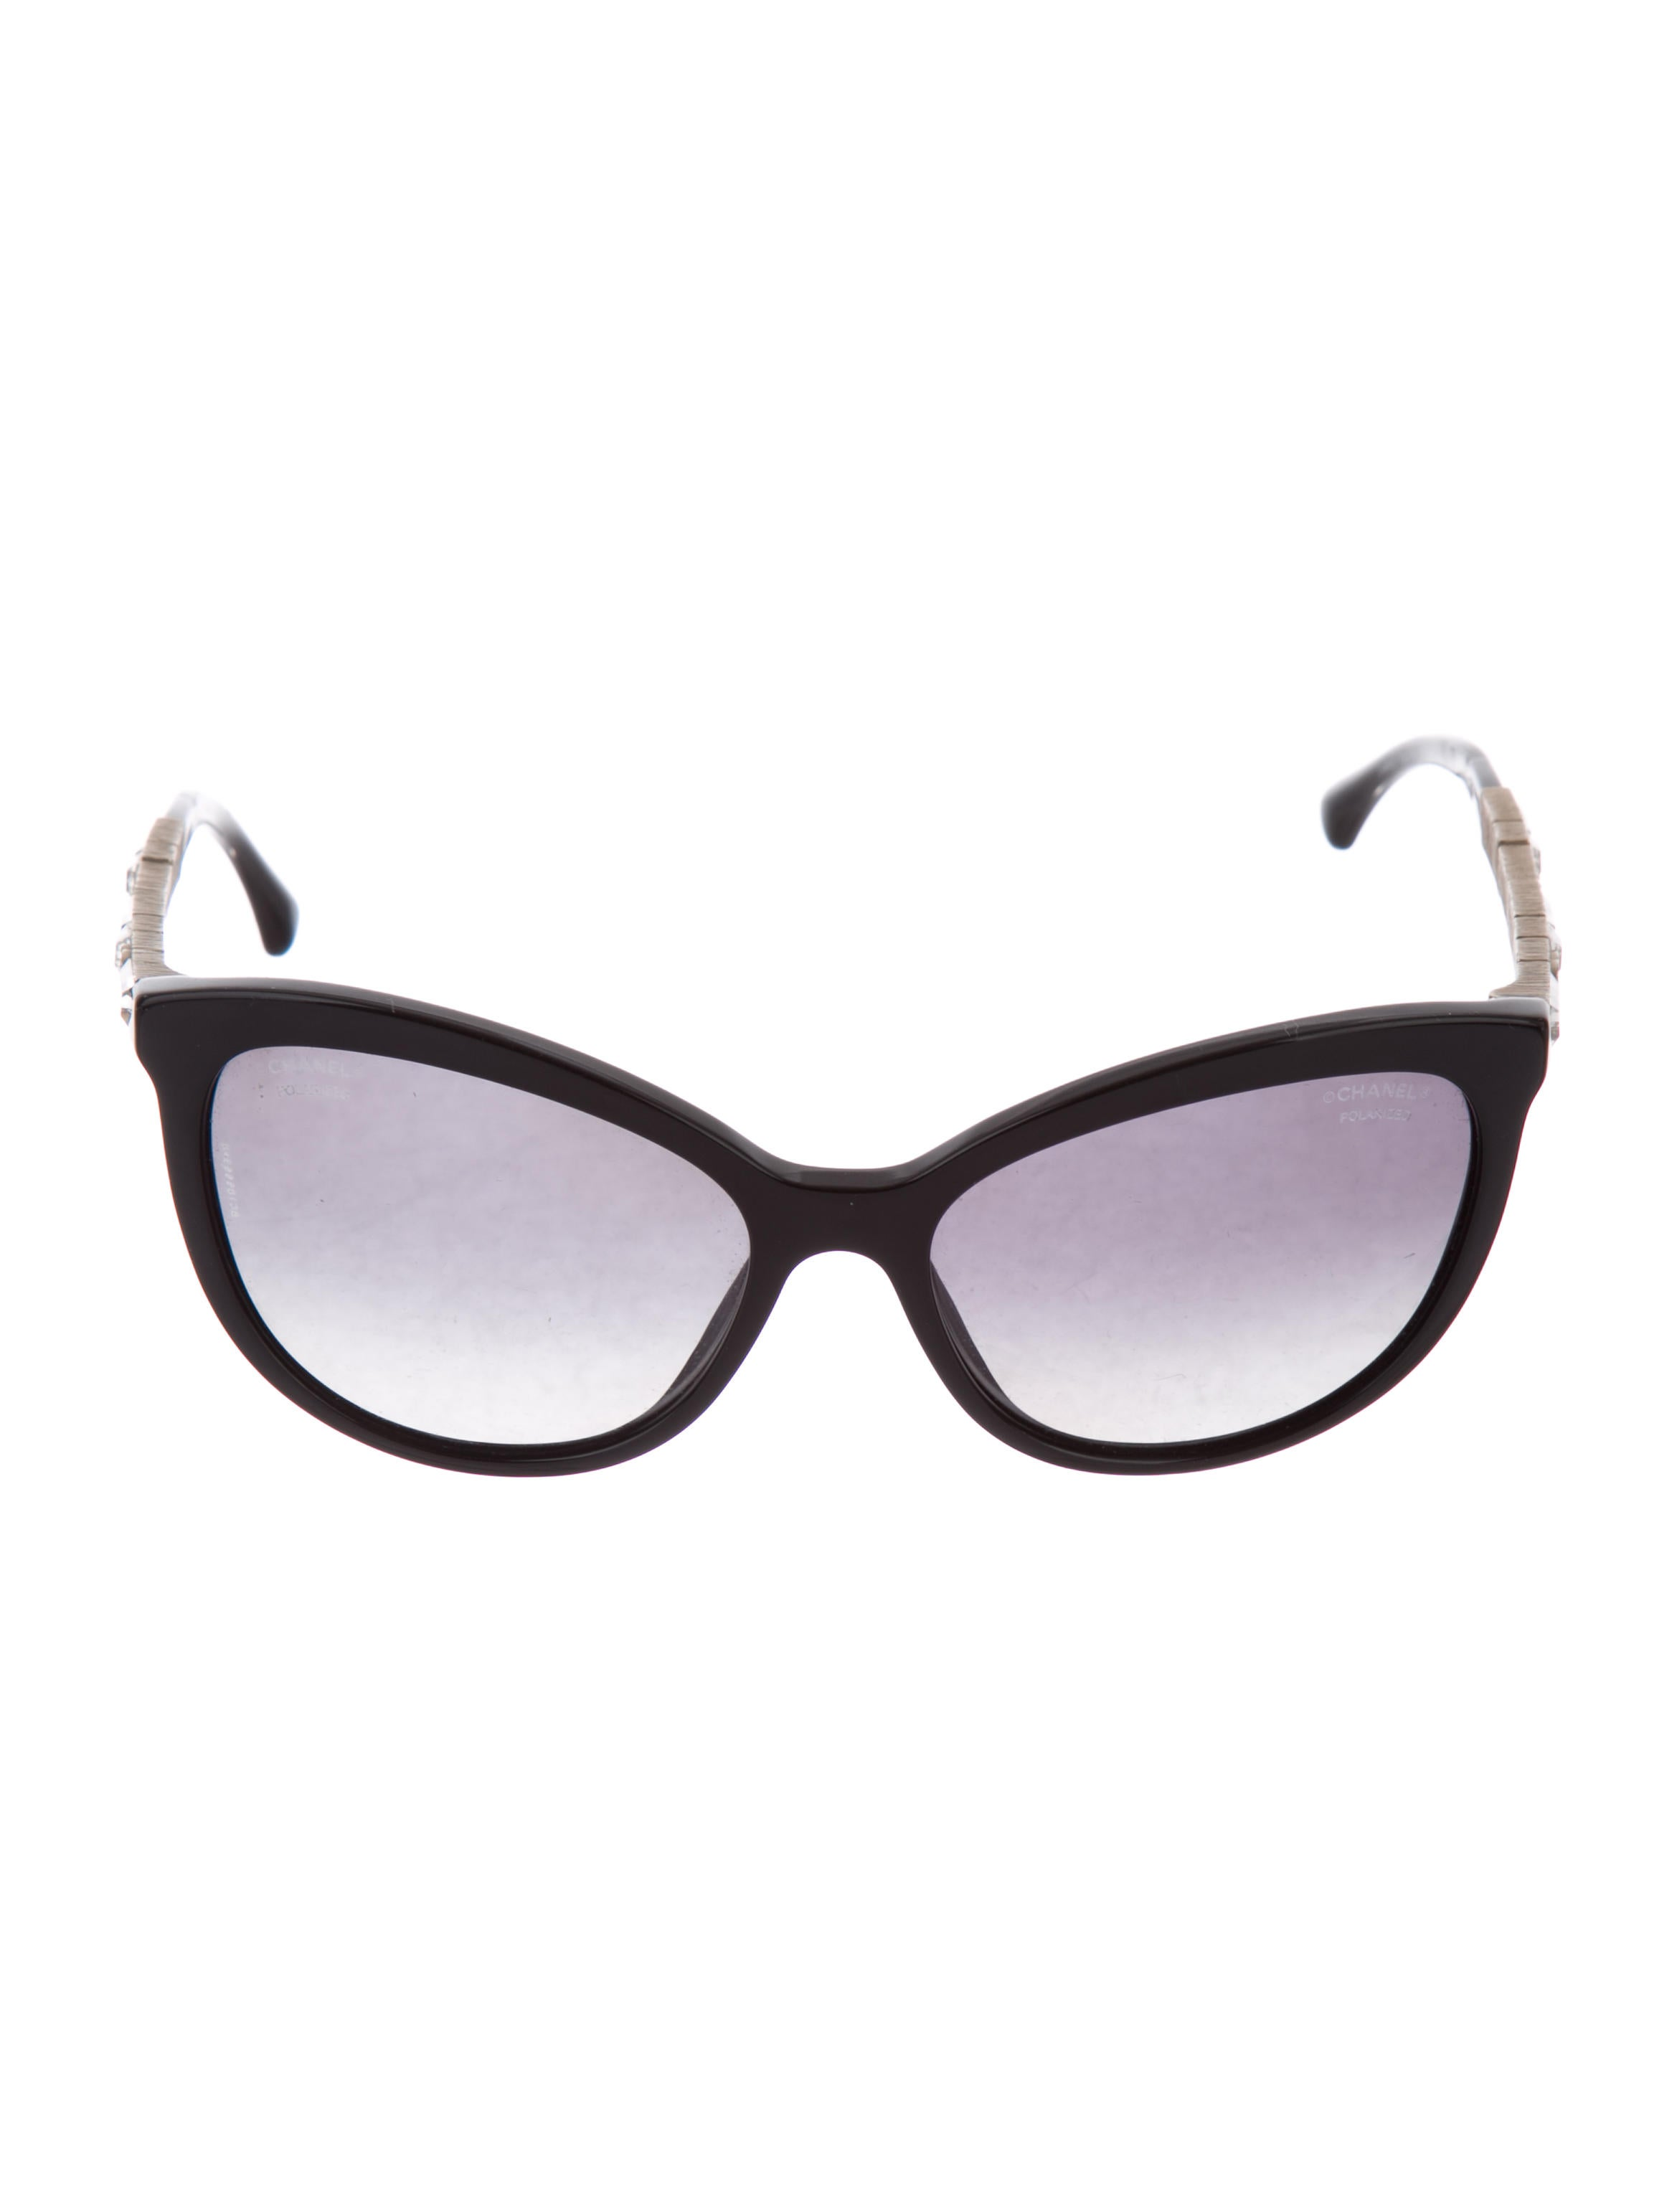 19b82424d1 Chanel Polarized Bijou Cat-Eye Sunglasses - Accessories - CHA269368 ...